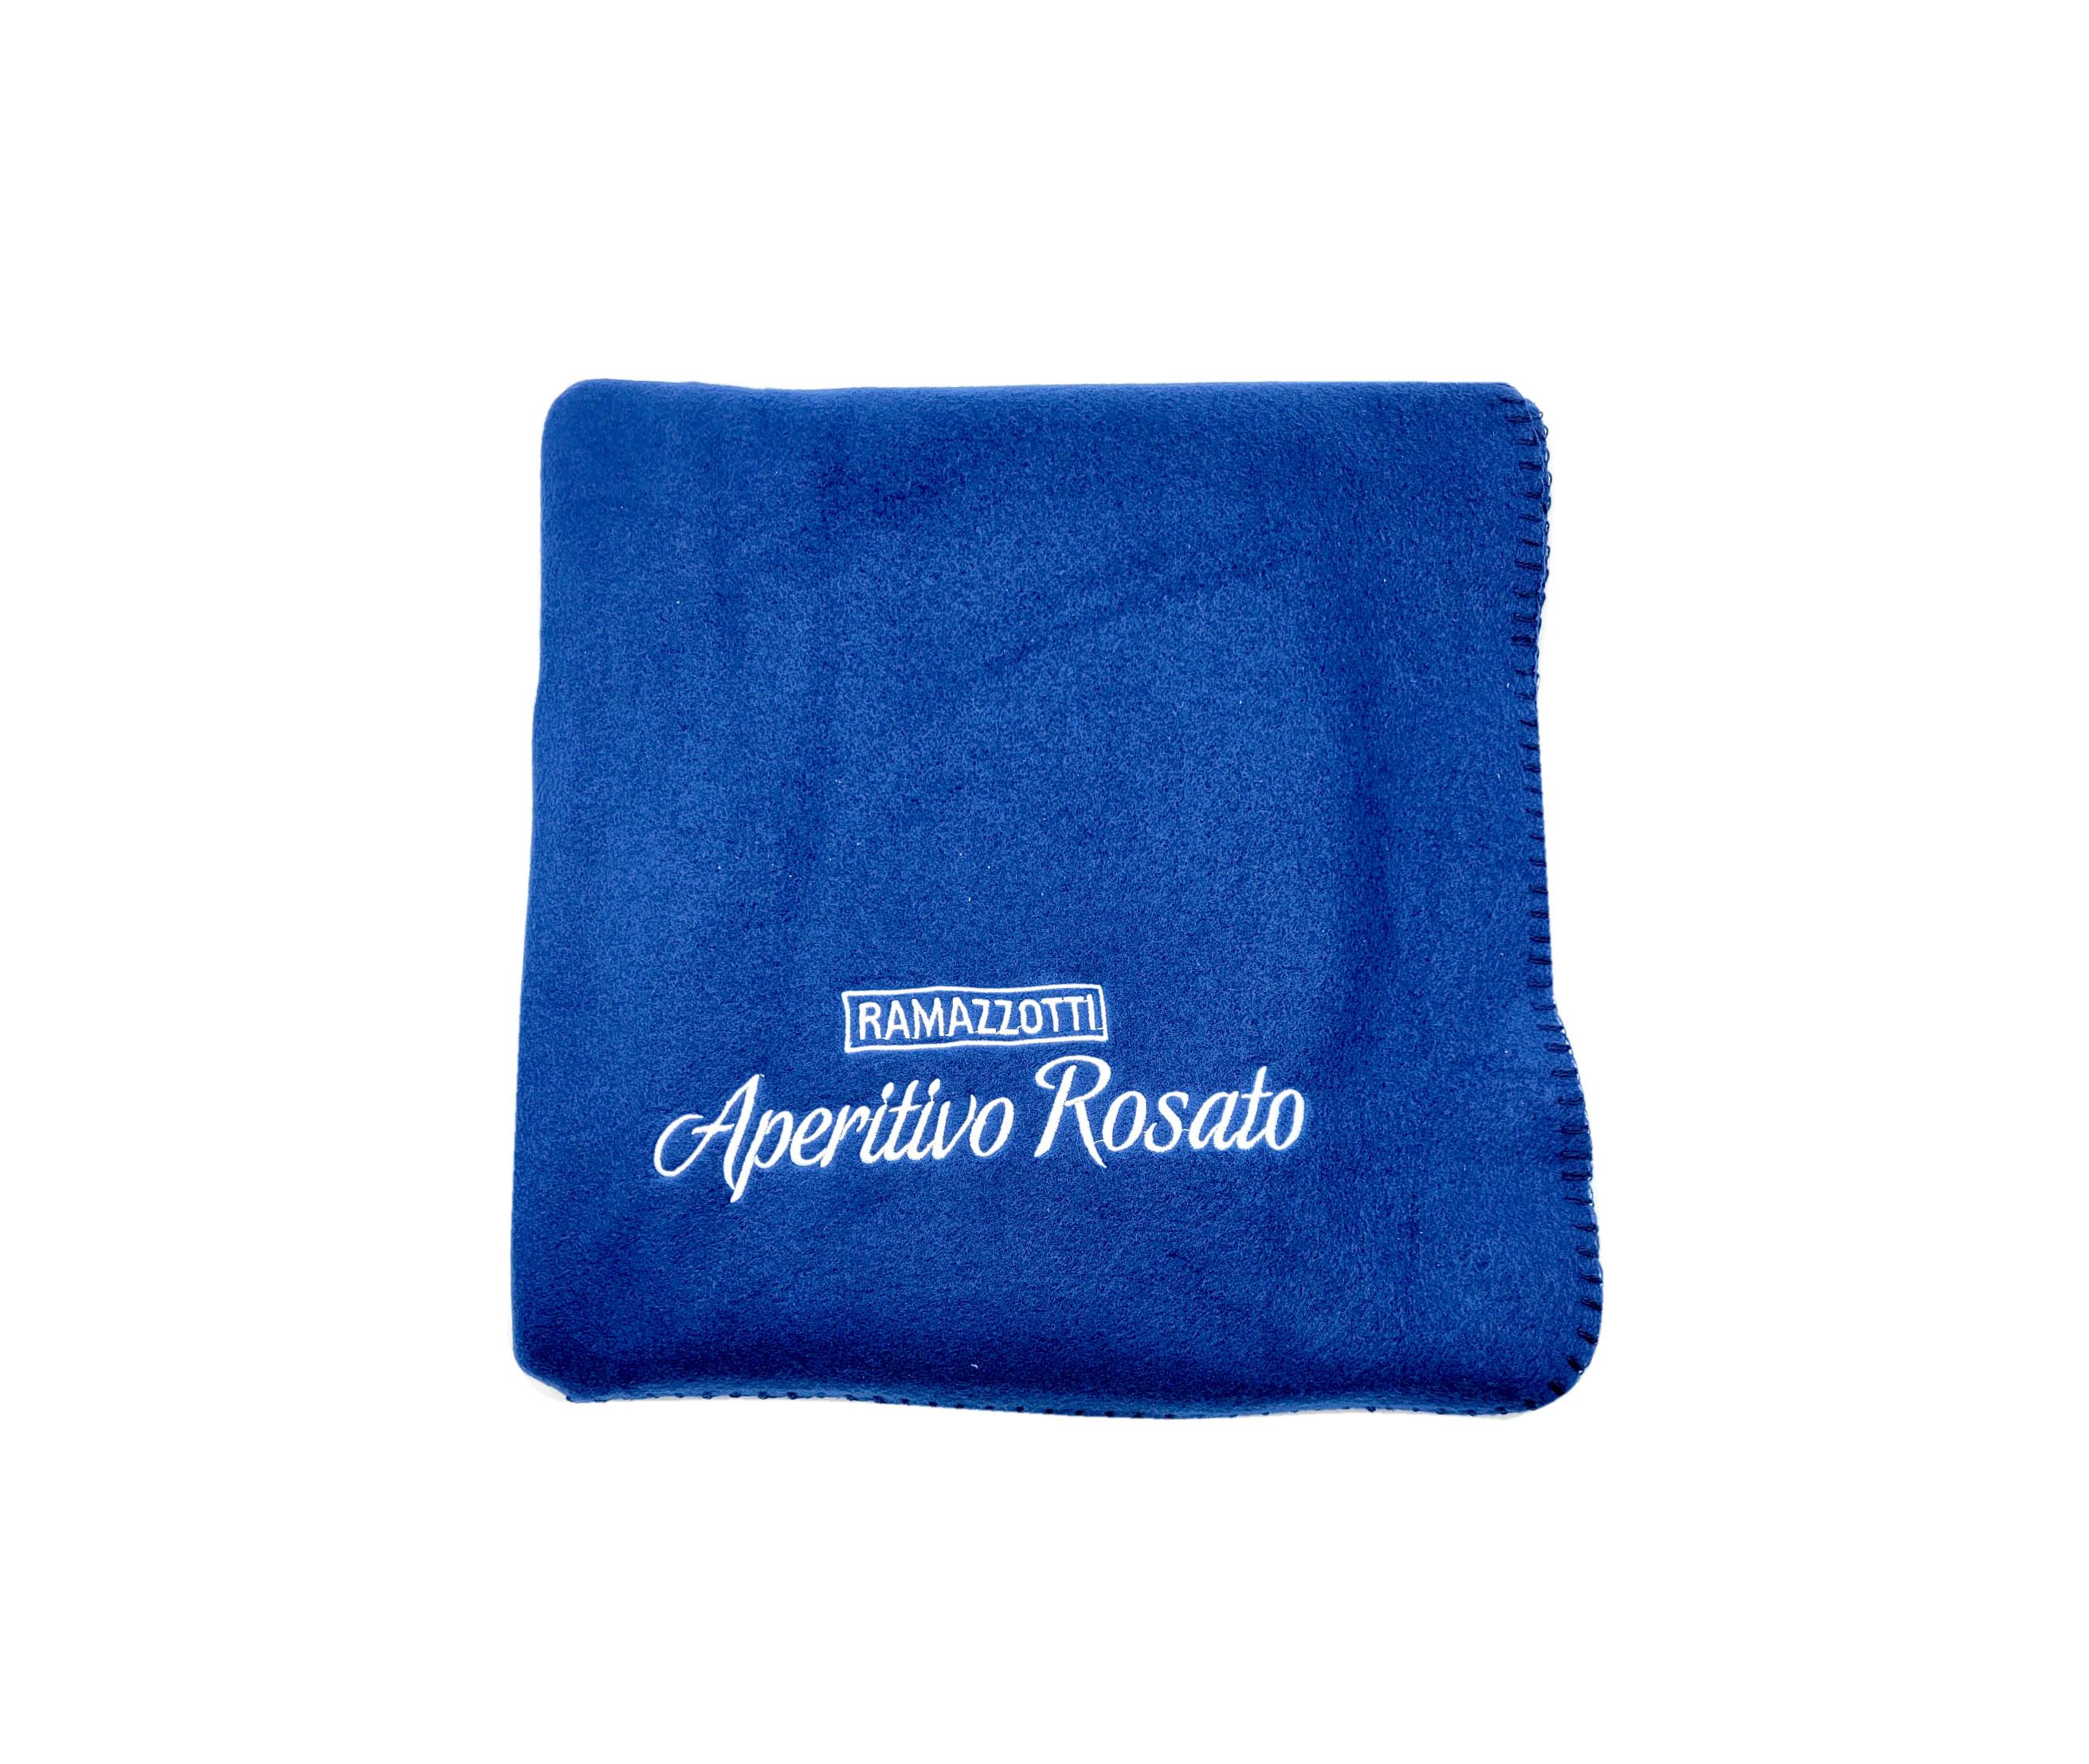 Ramazzotti Aperitivo Rosato Decke Kuscheldecke 100% Polyester - blau - ca. 150x120cm